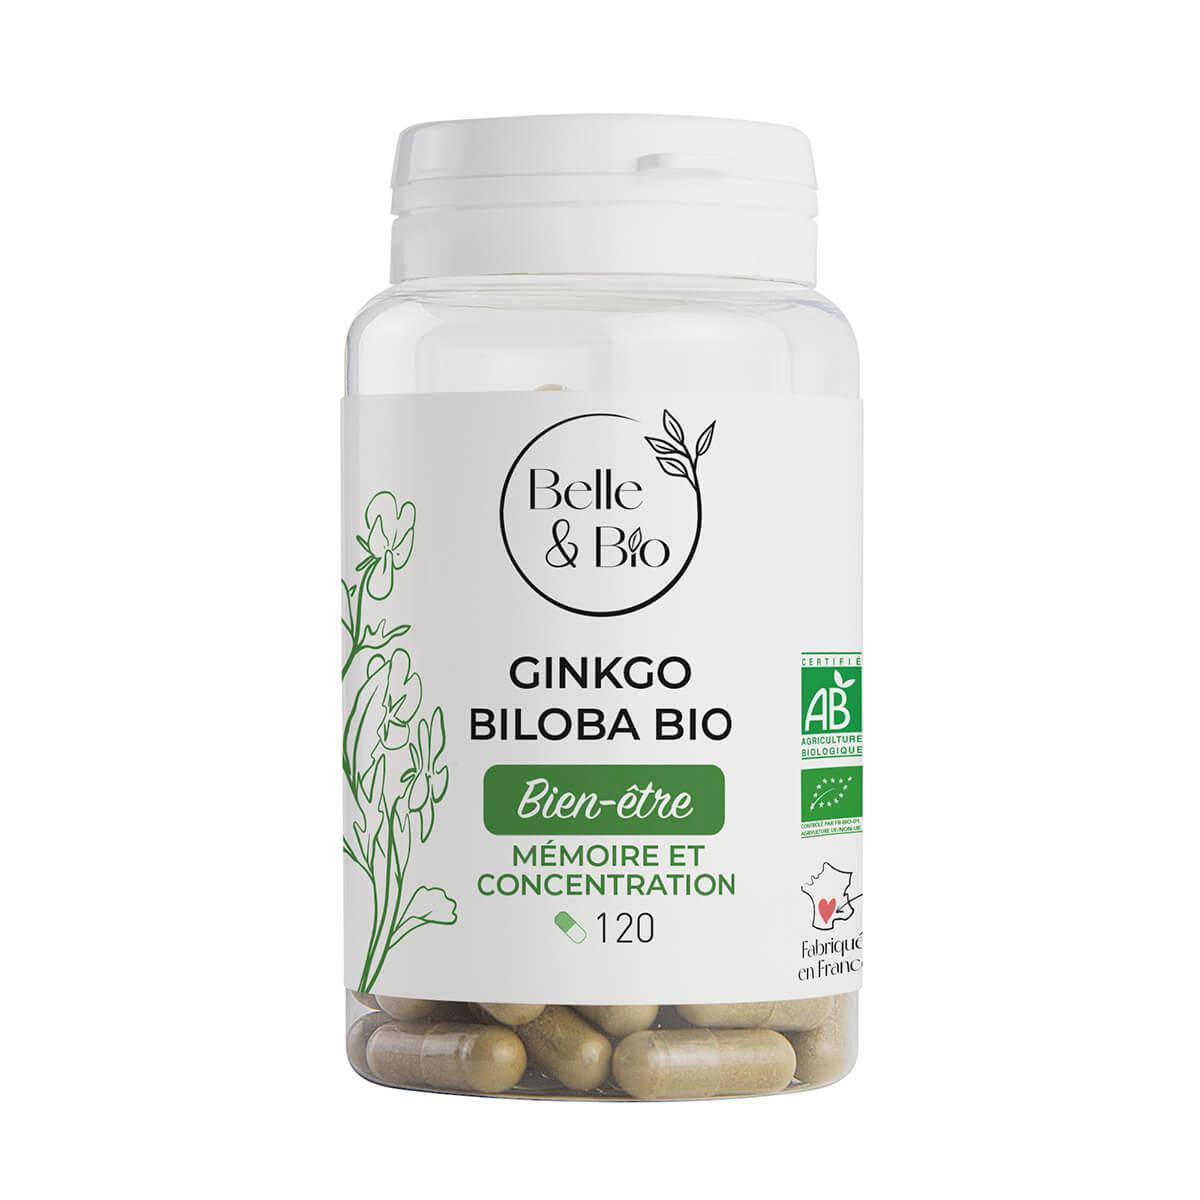 Belle & Bio - Gingko Bio - 120 Gelules - Certifie par Ecocert